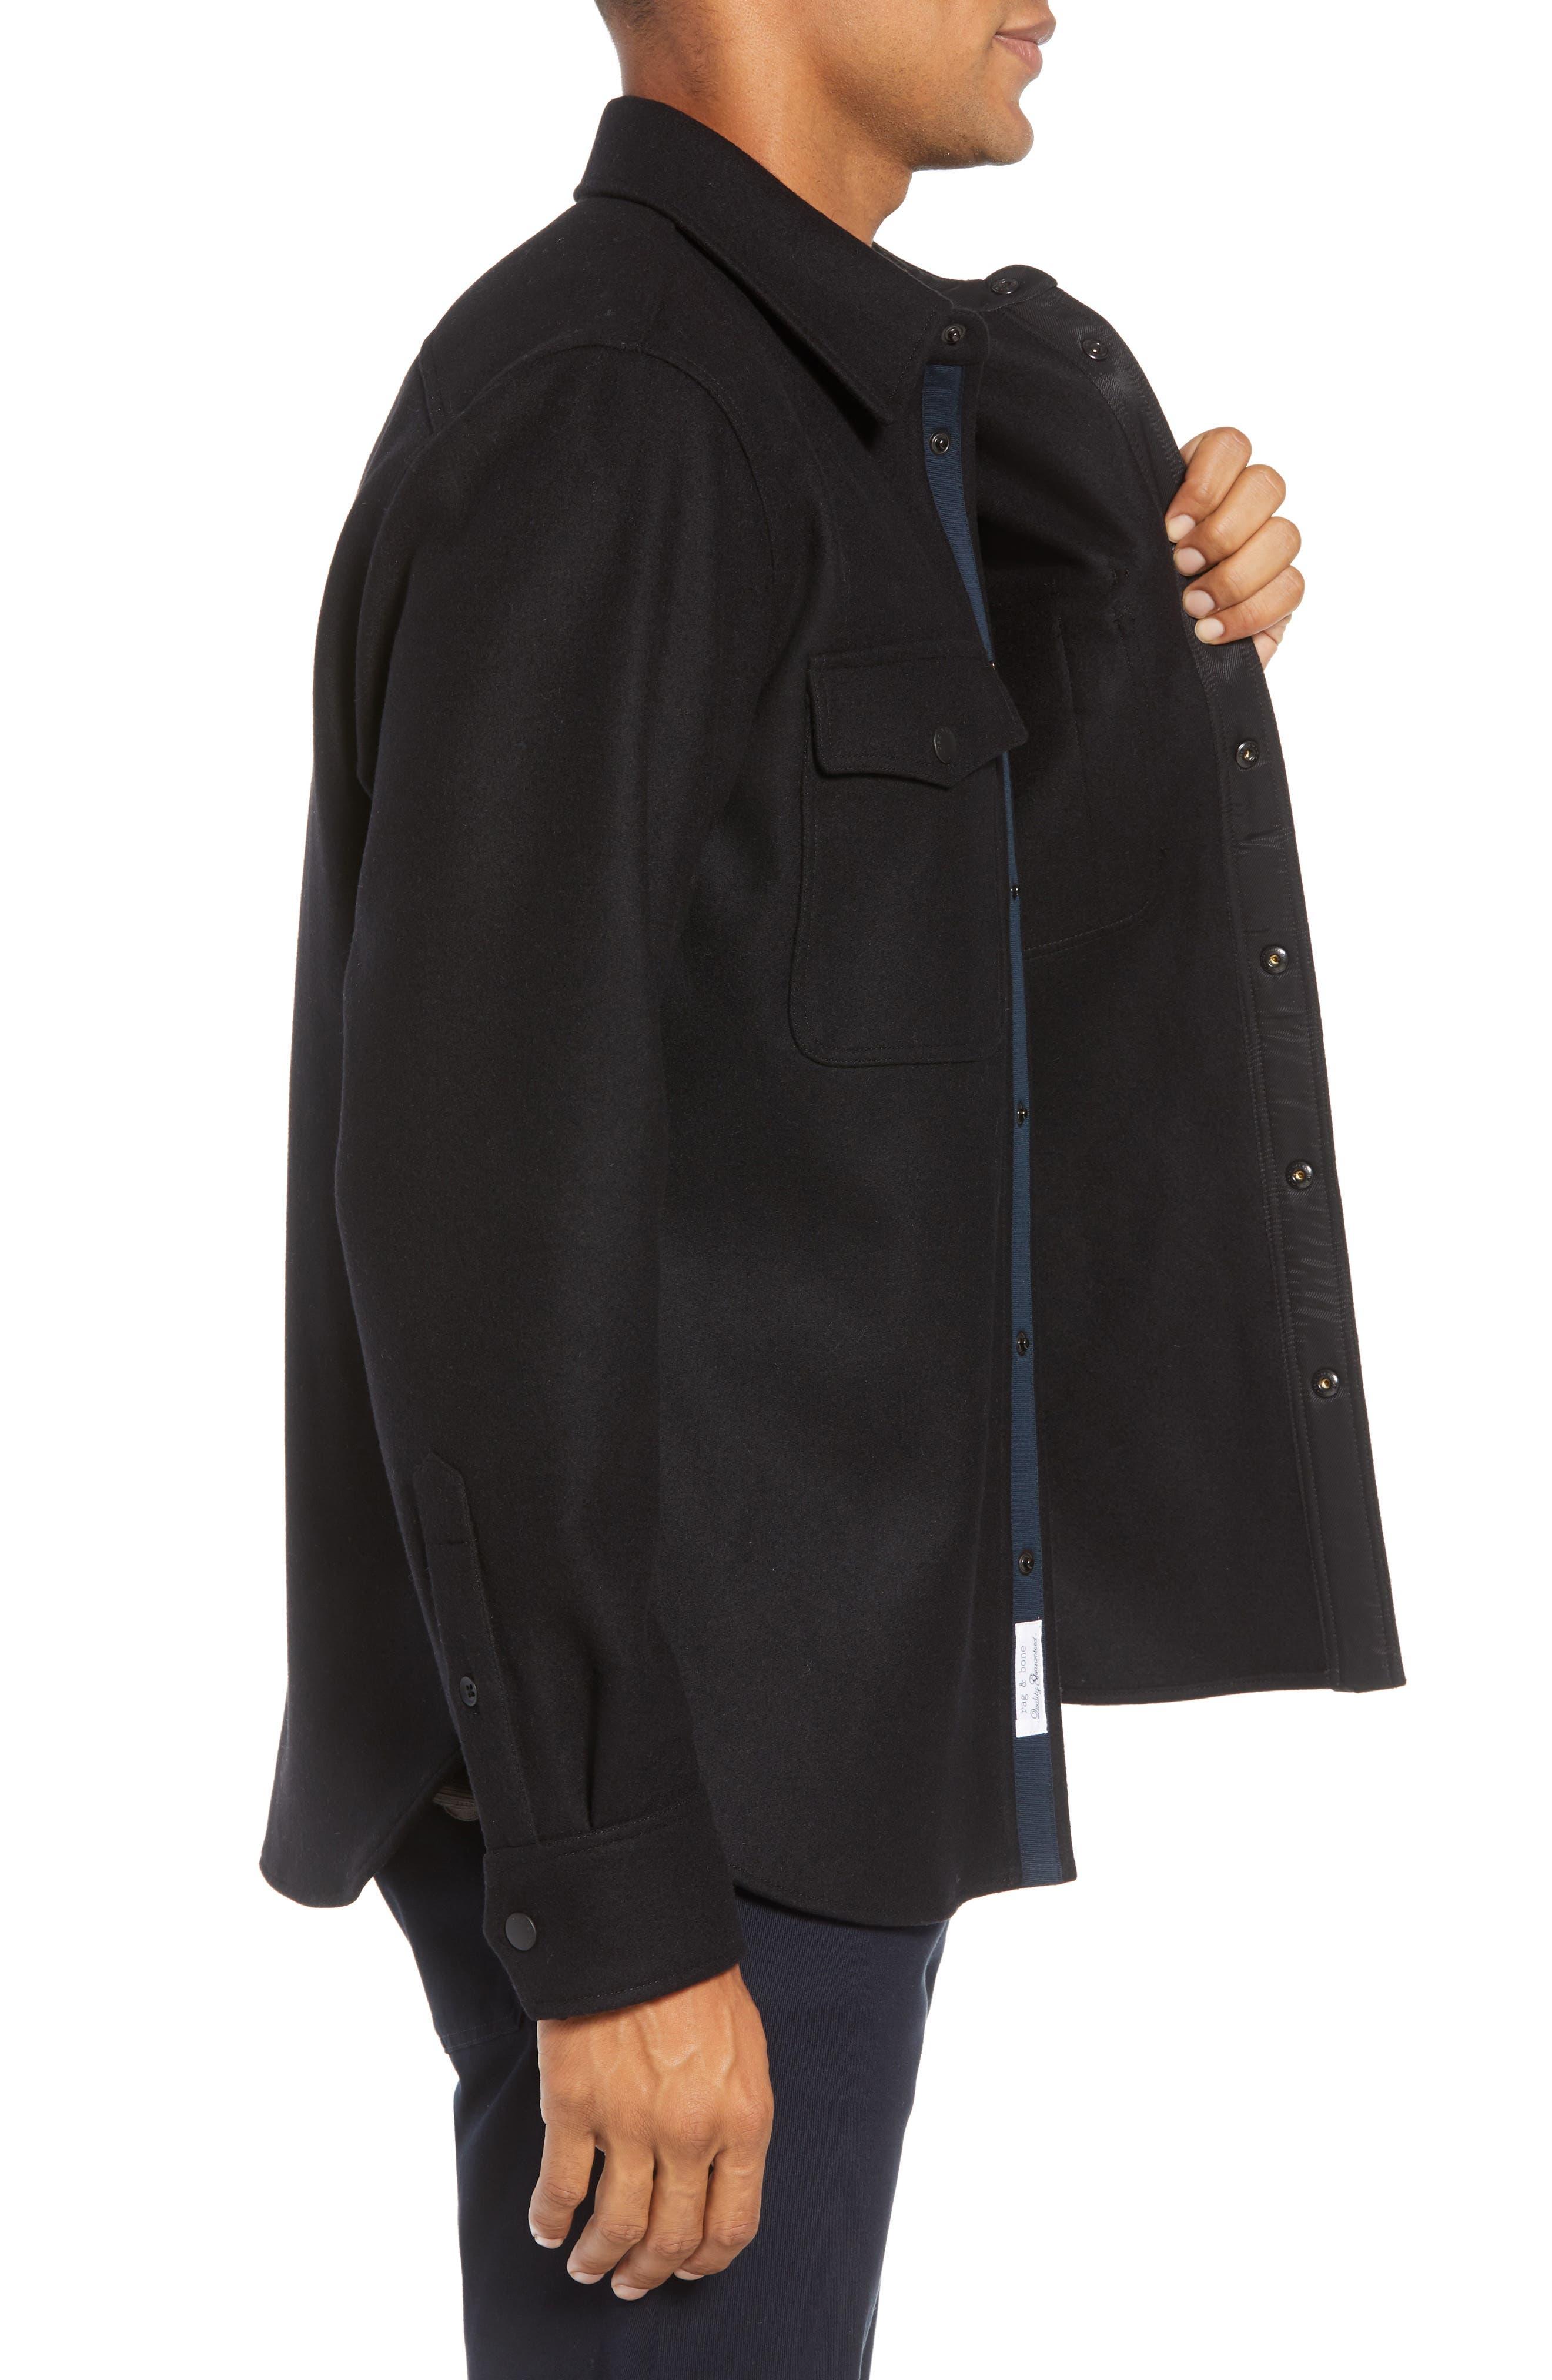 Jack Regular Fit Shirt Jacket,                             Alternate thumbnail 3, color,                             001